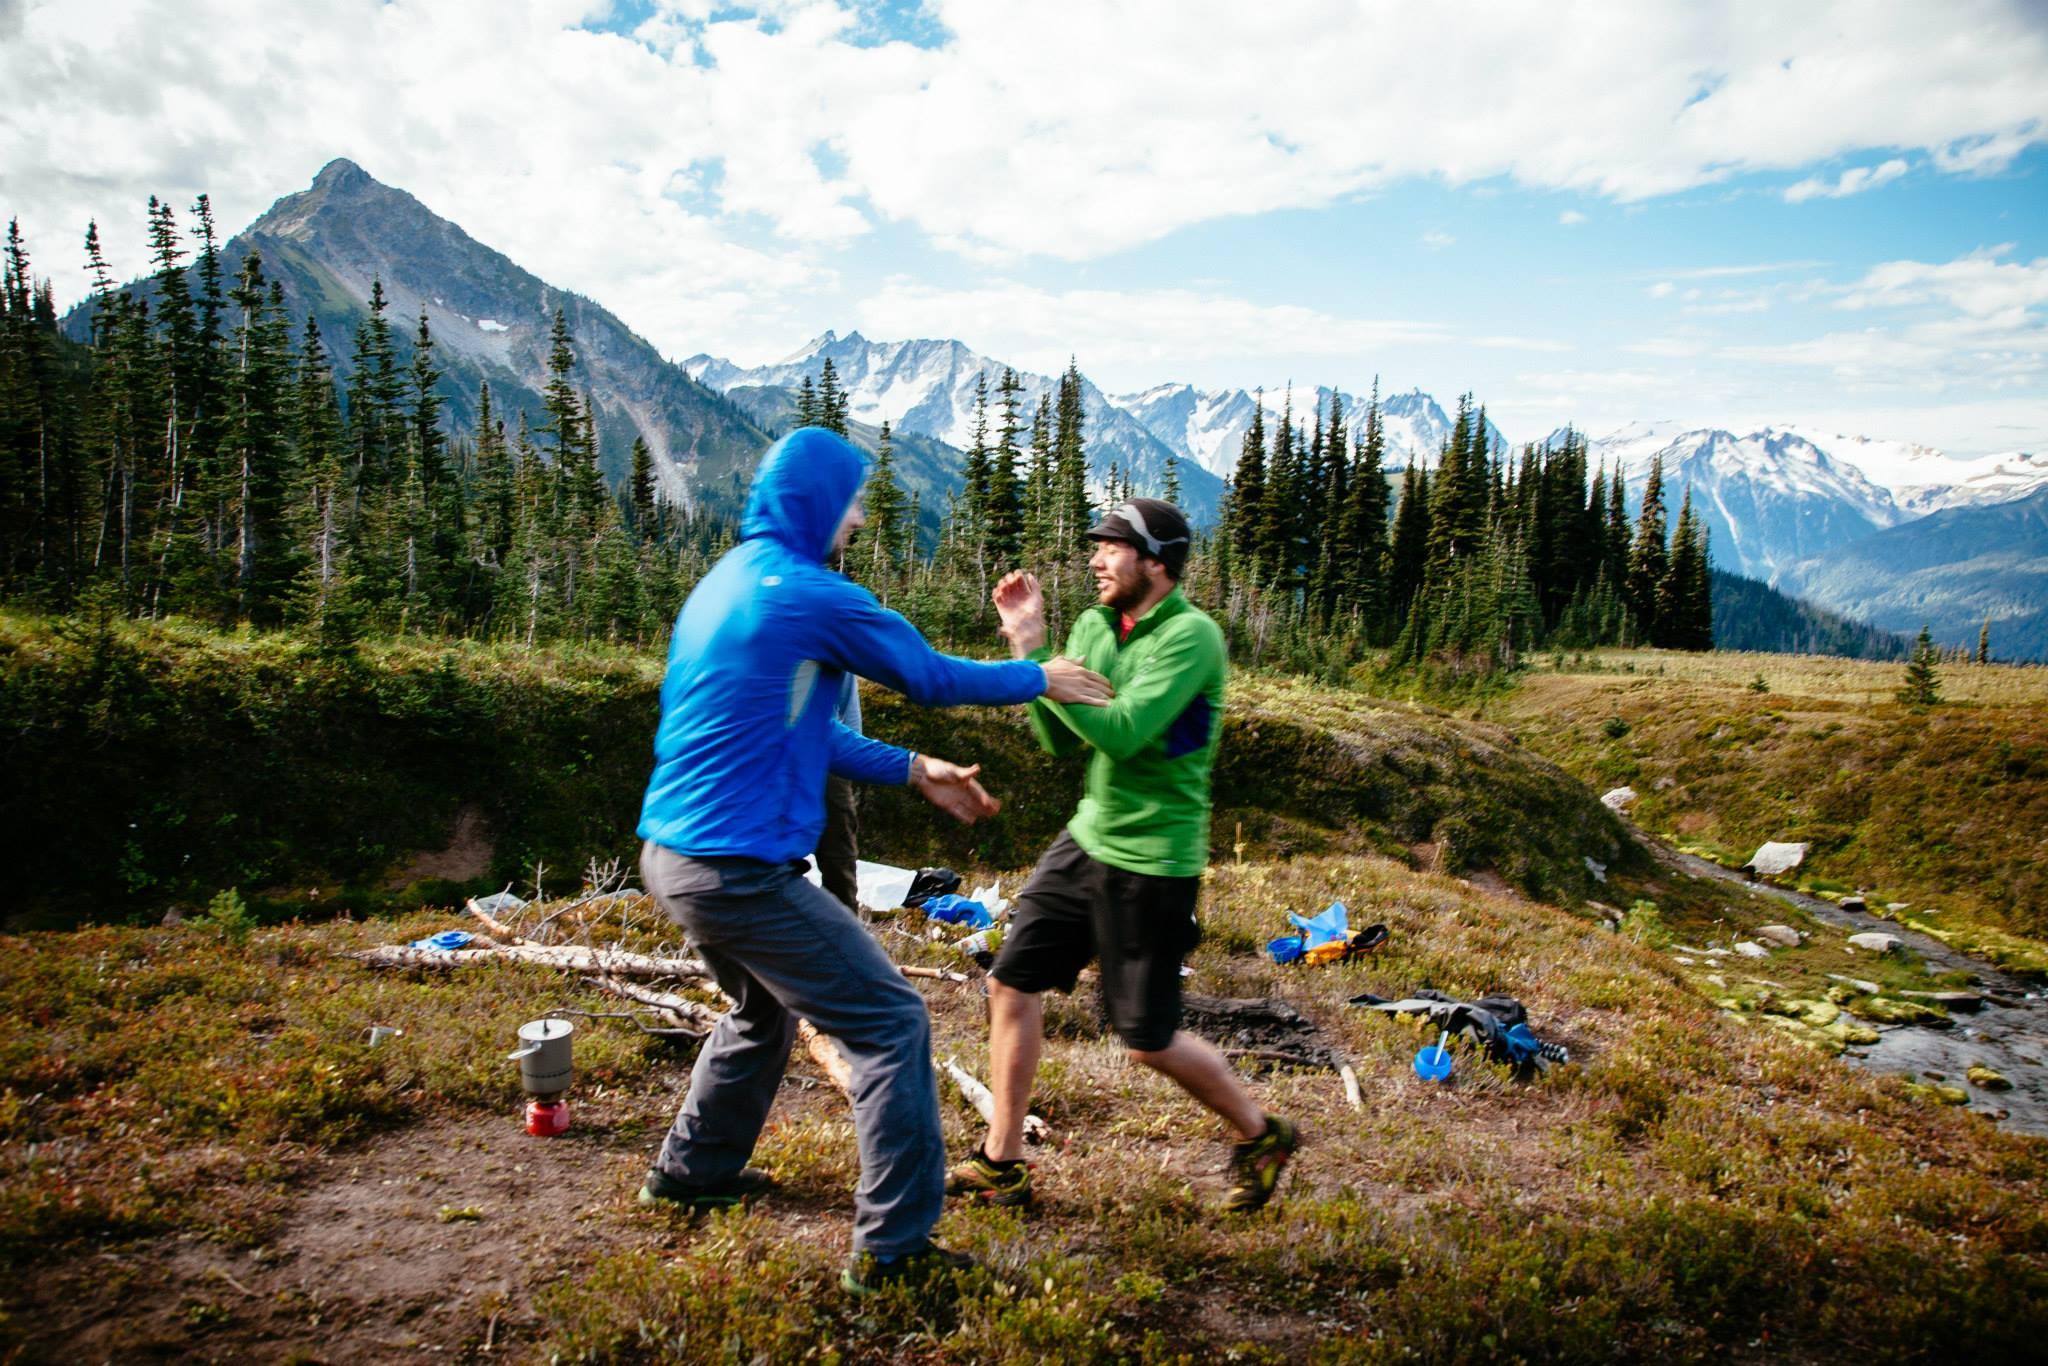 You Ate My Snickers! – Chris & Ben @ Glacier Peak Wilderness,2013